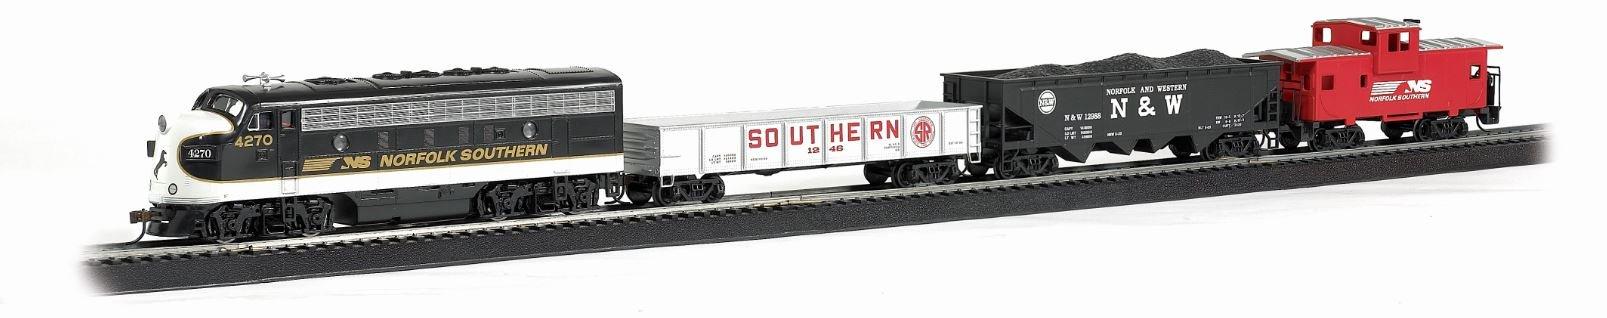 Bachmann Trains Thoroughbred Ready Scale